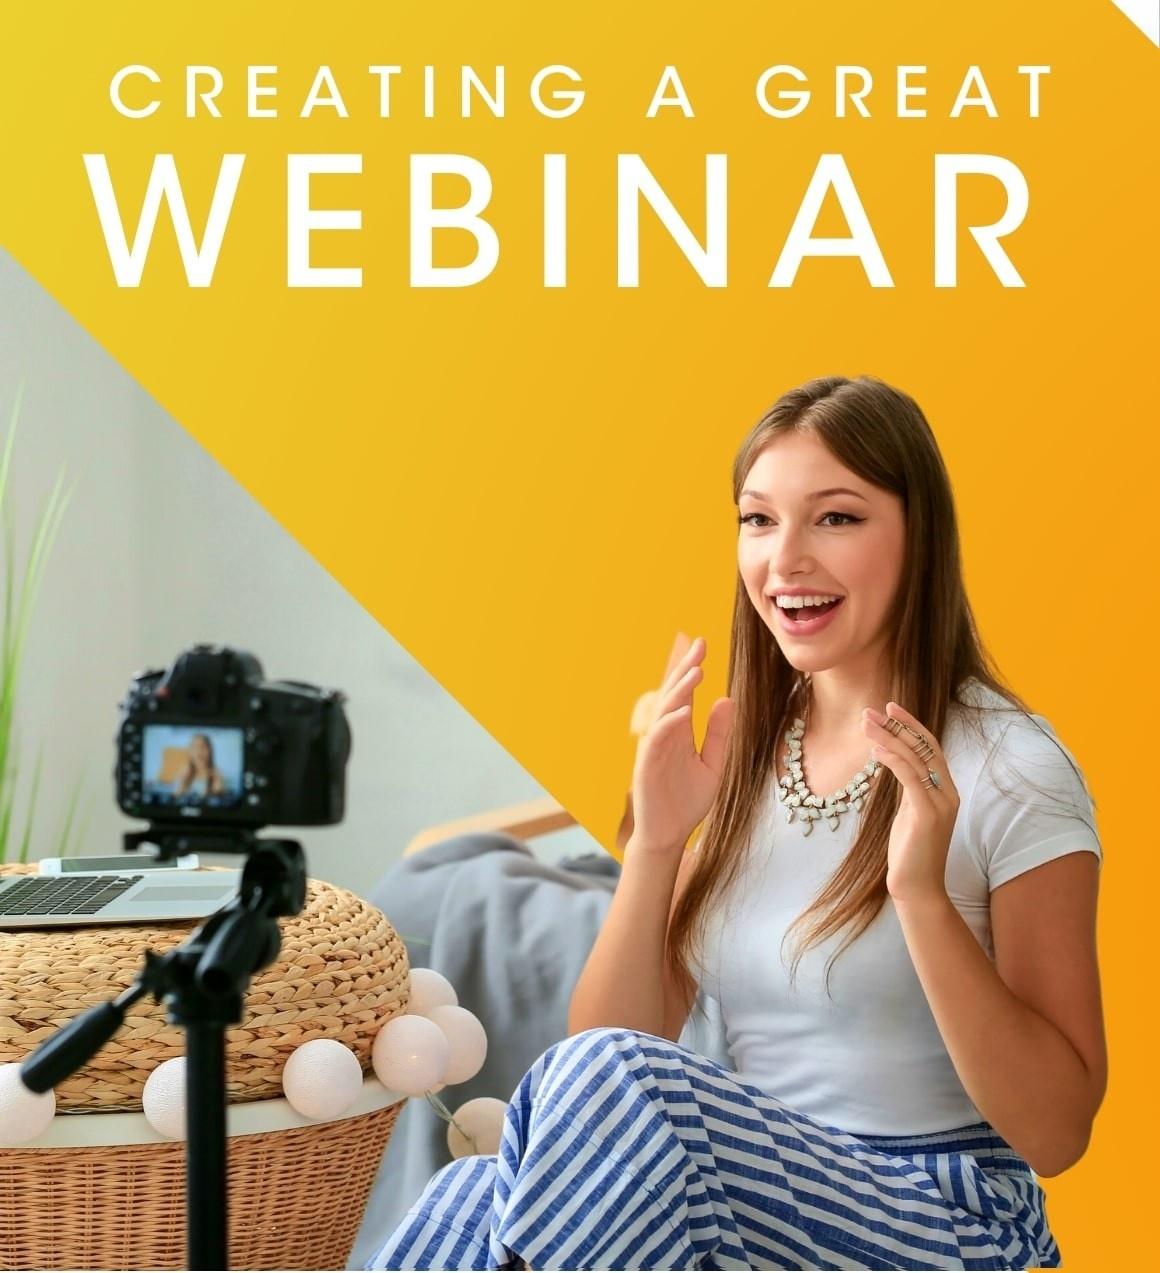 Creating a great webinar